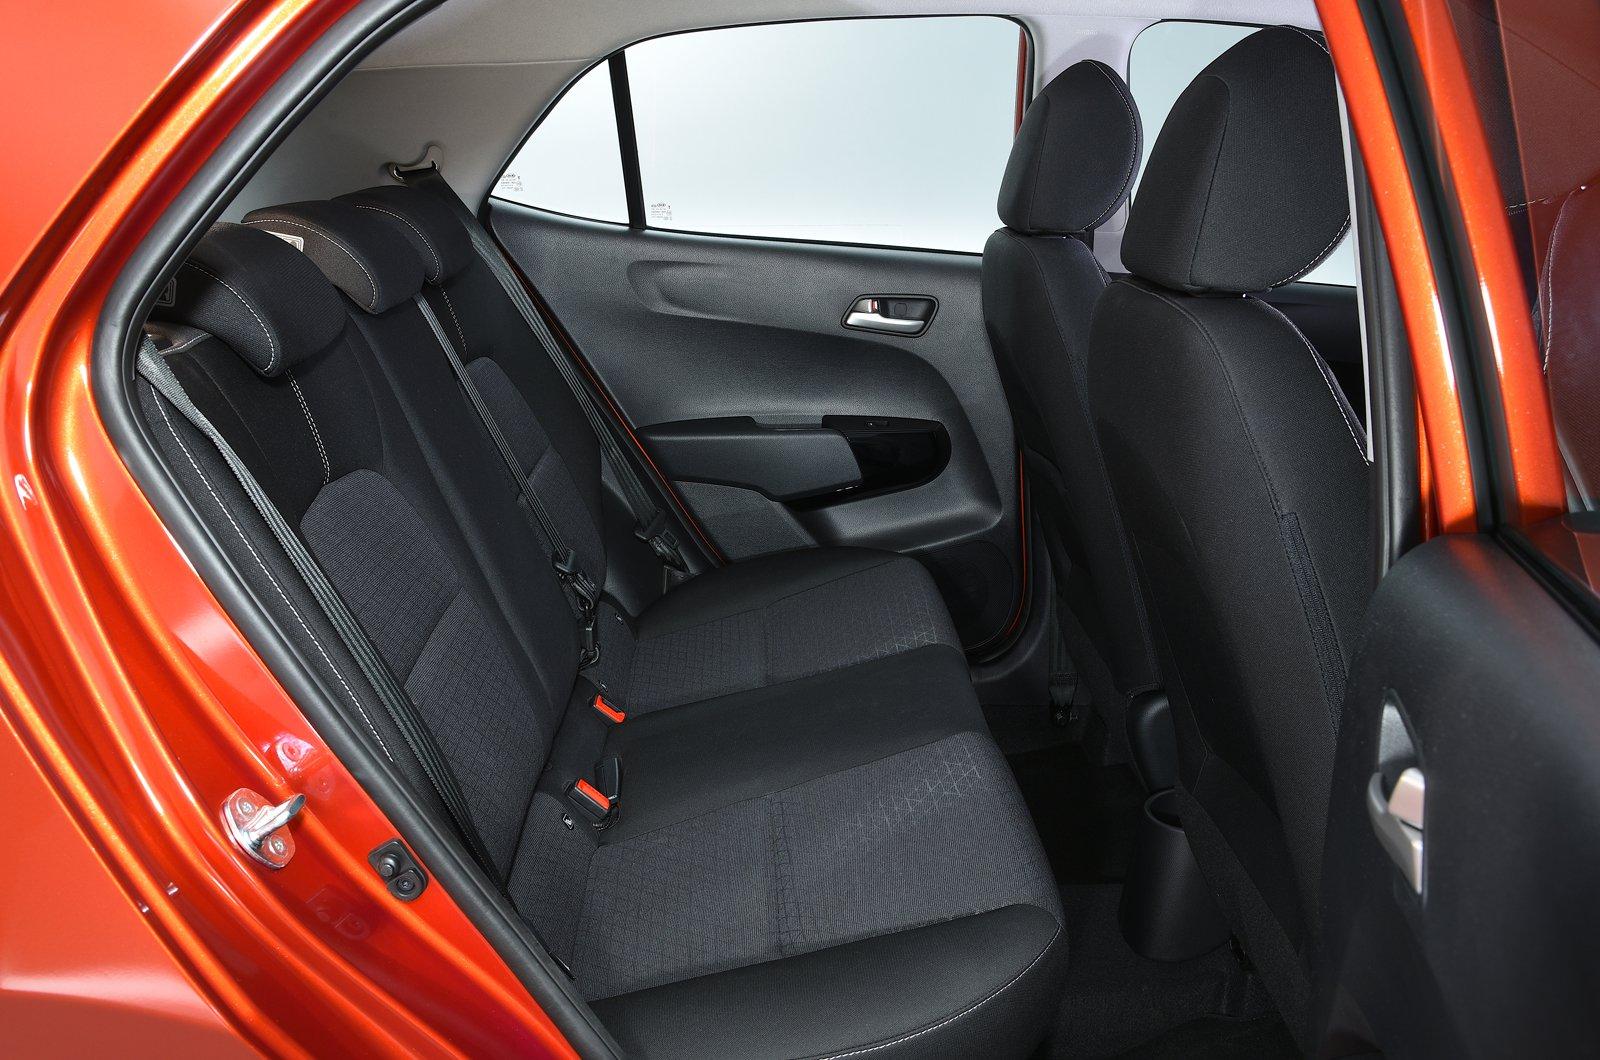 Kia Picanto rear seats - 69-plate car